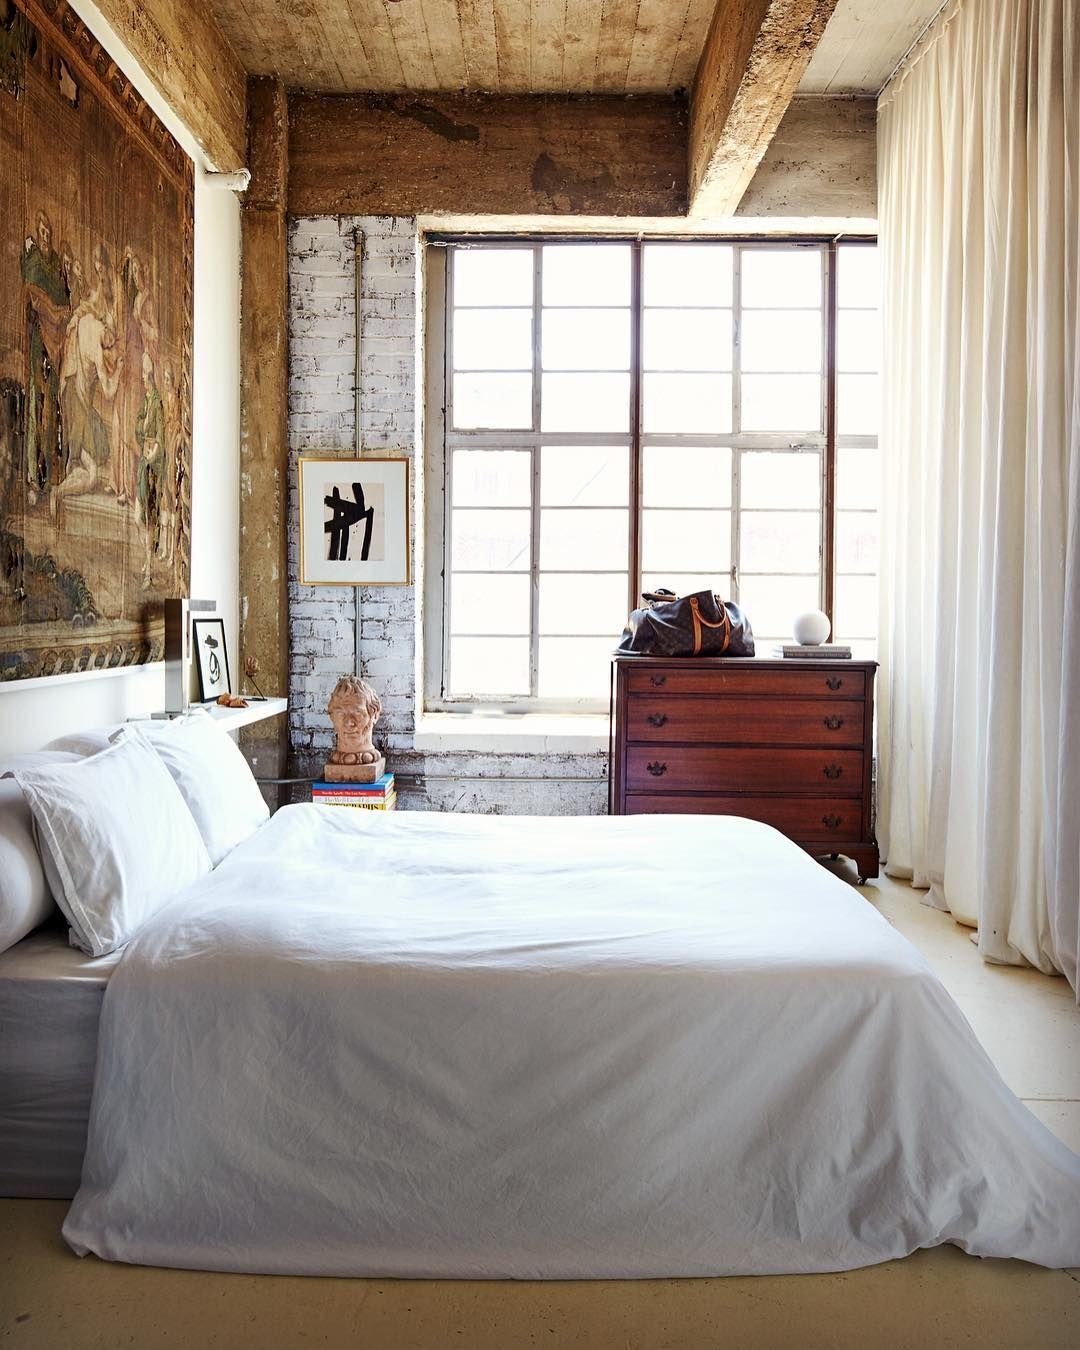 Loft bedroom images  William McClureus Alabama Loft Take Two  Loft bedrooms Lofts and